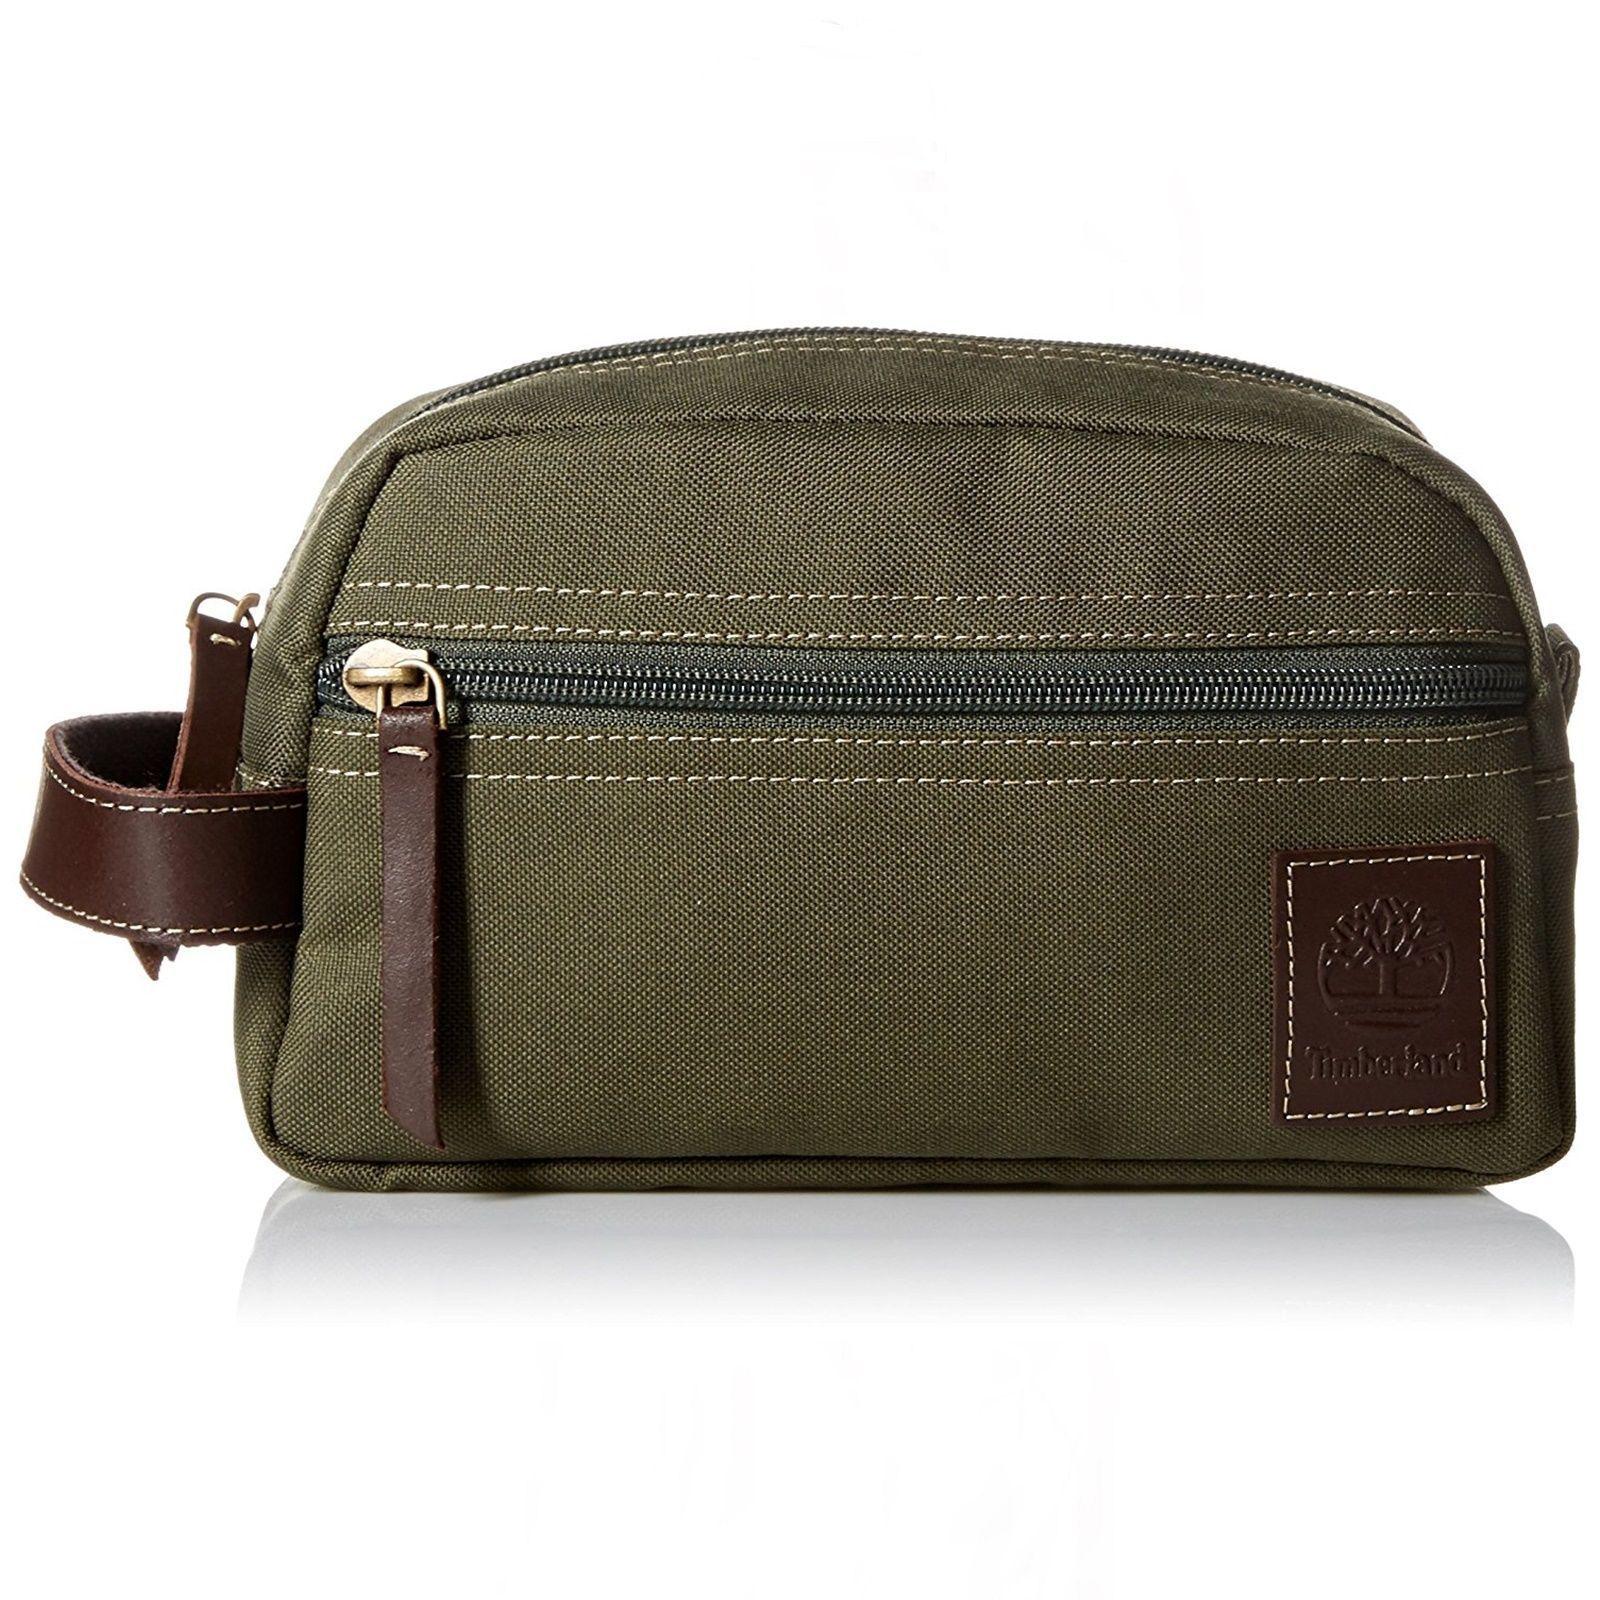 c443390c7c Timberland Men S Canvas Travel Kit Organizer Toiletry Bag Overnight Dopp Kit